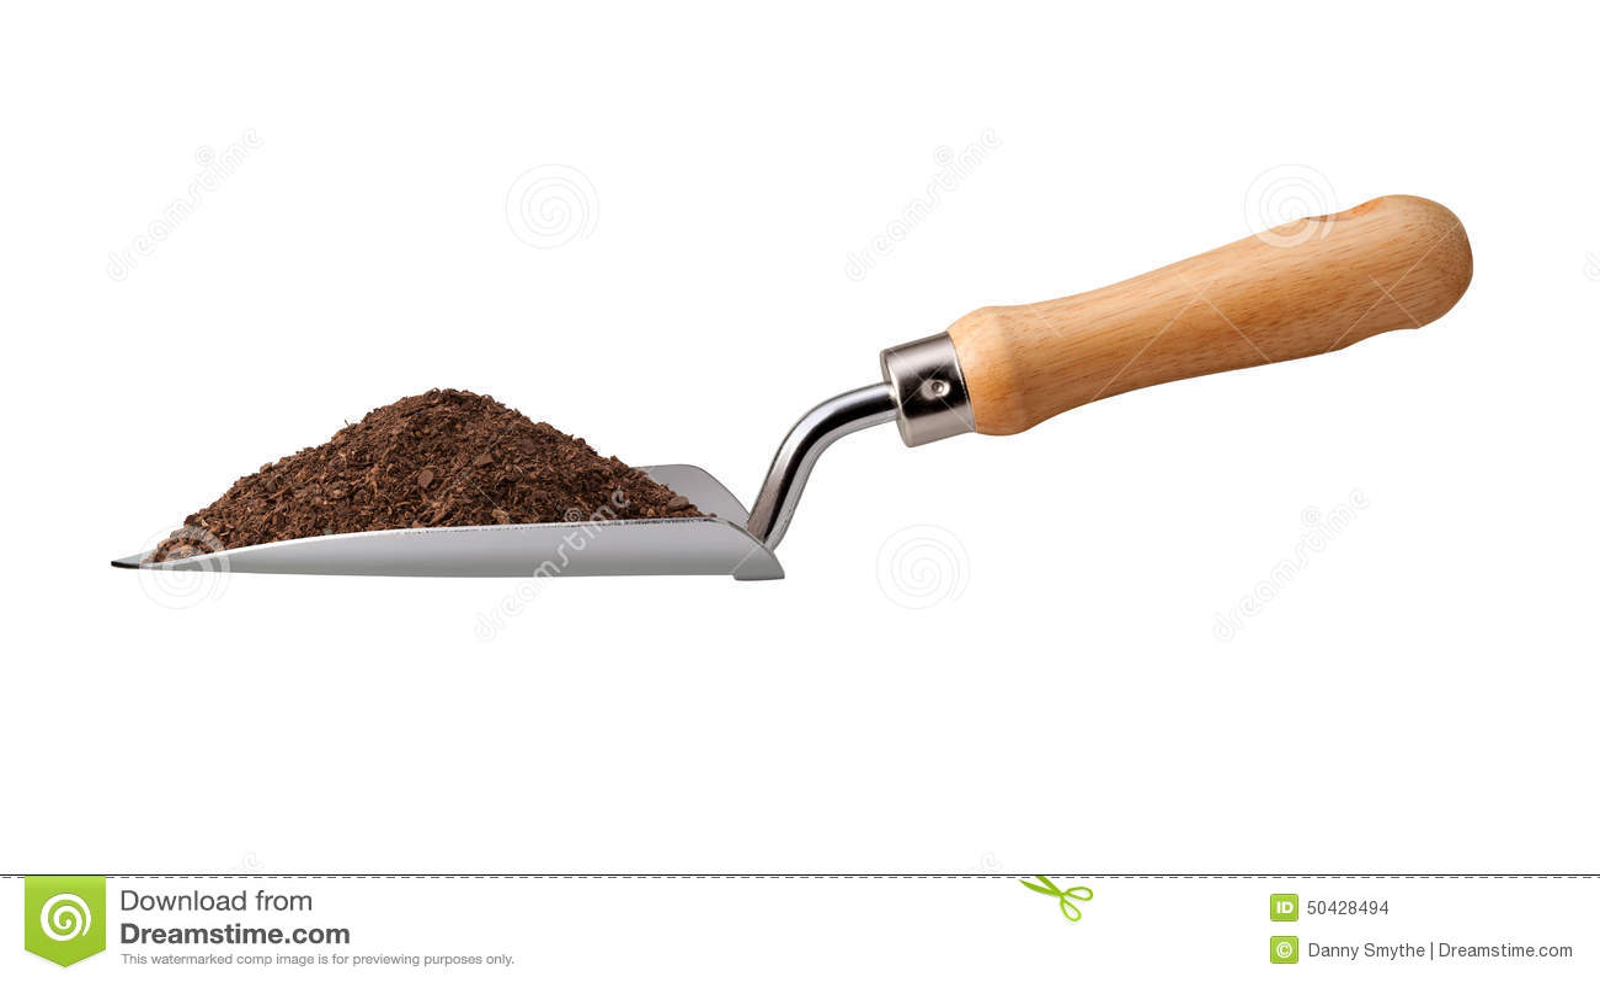 Trowel Clip Art : Garden trowel with potting soil stock photo image